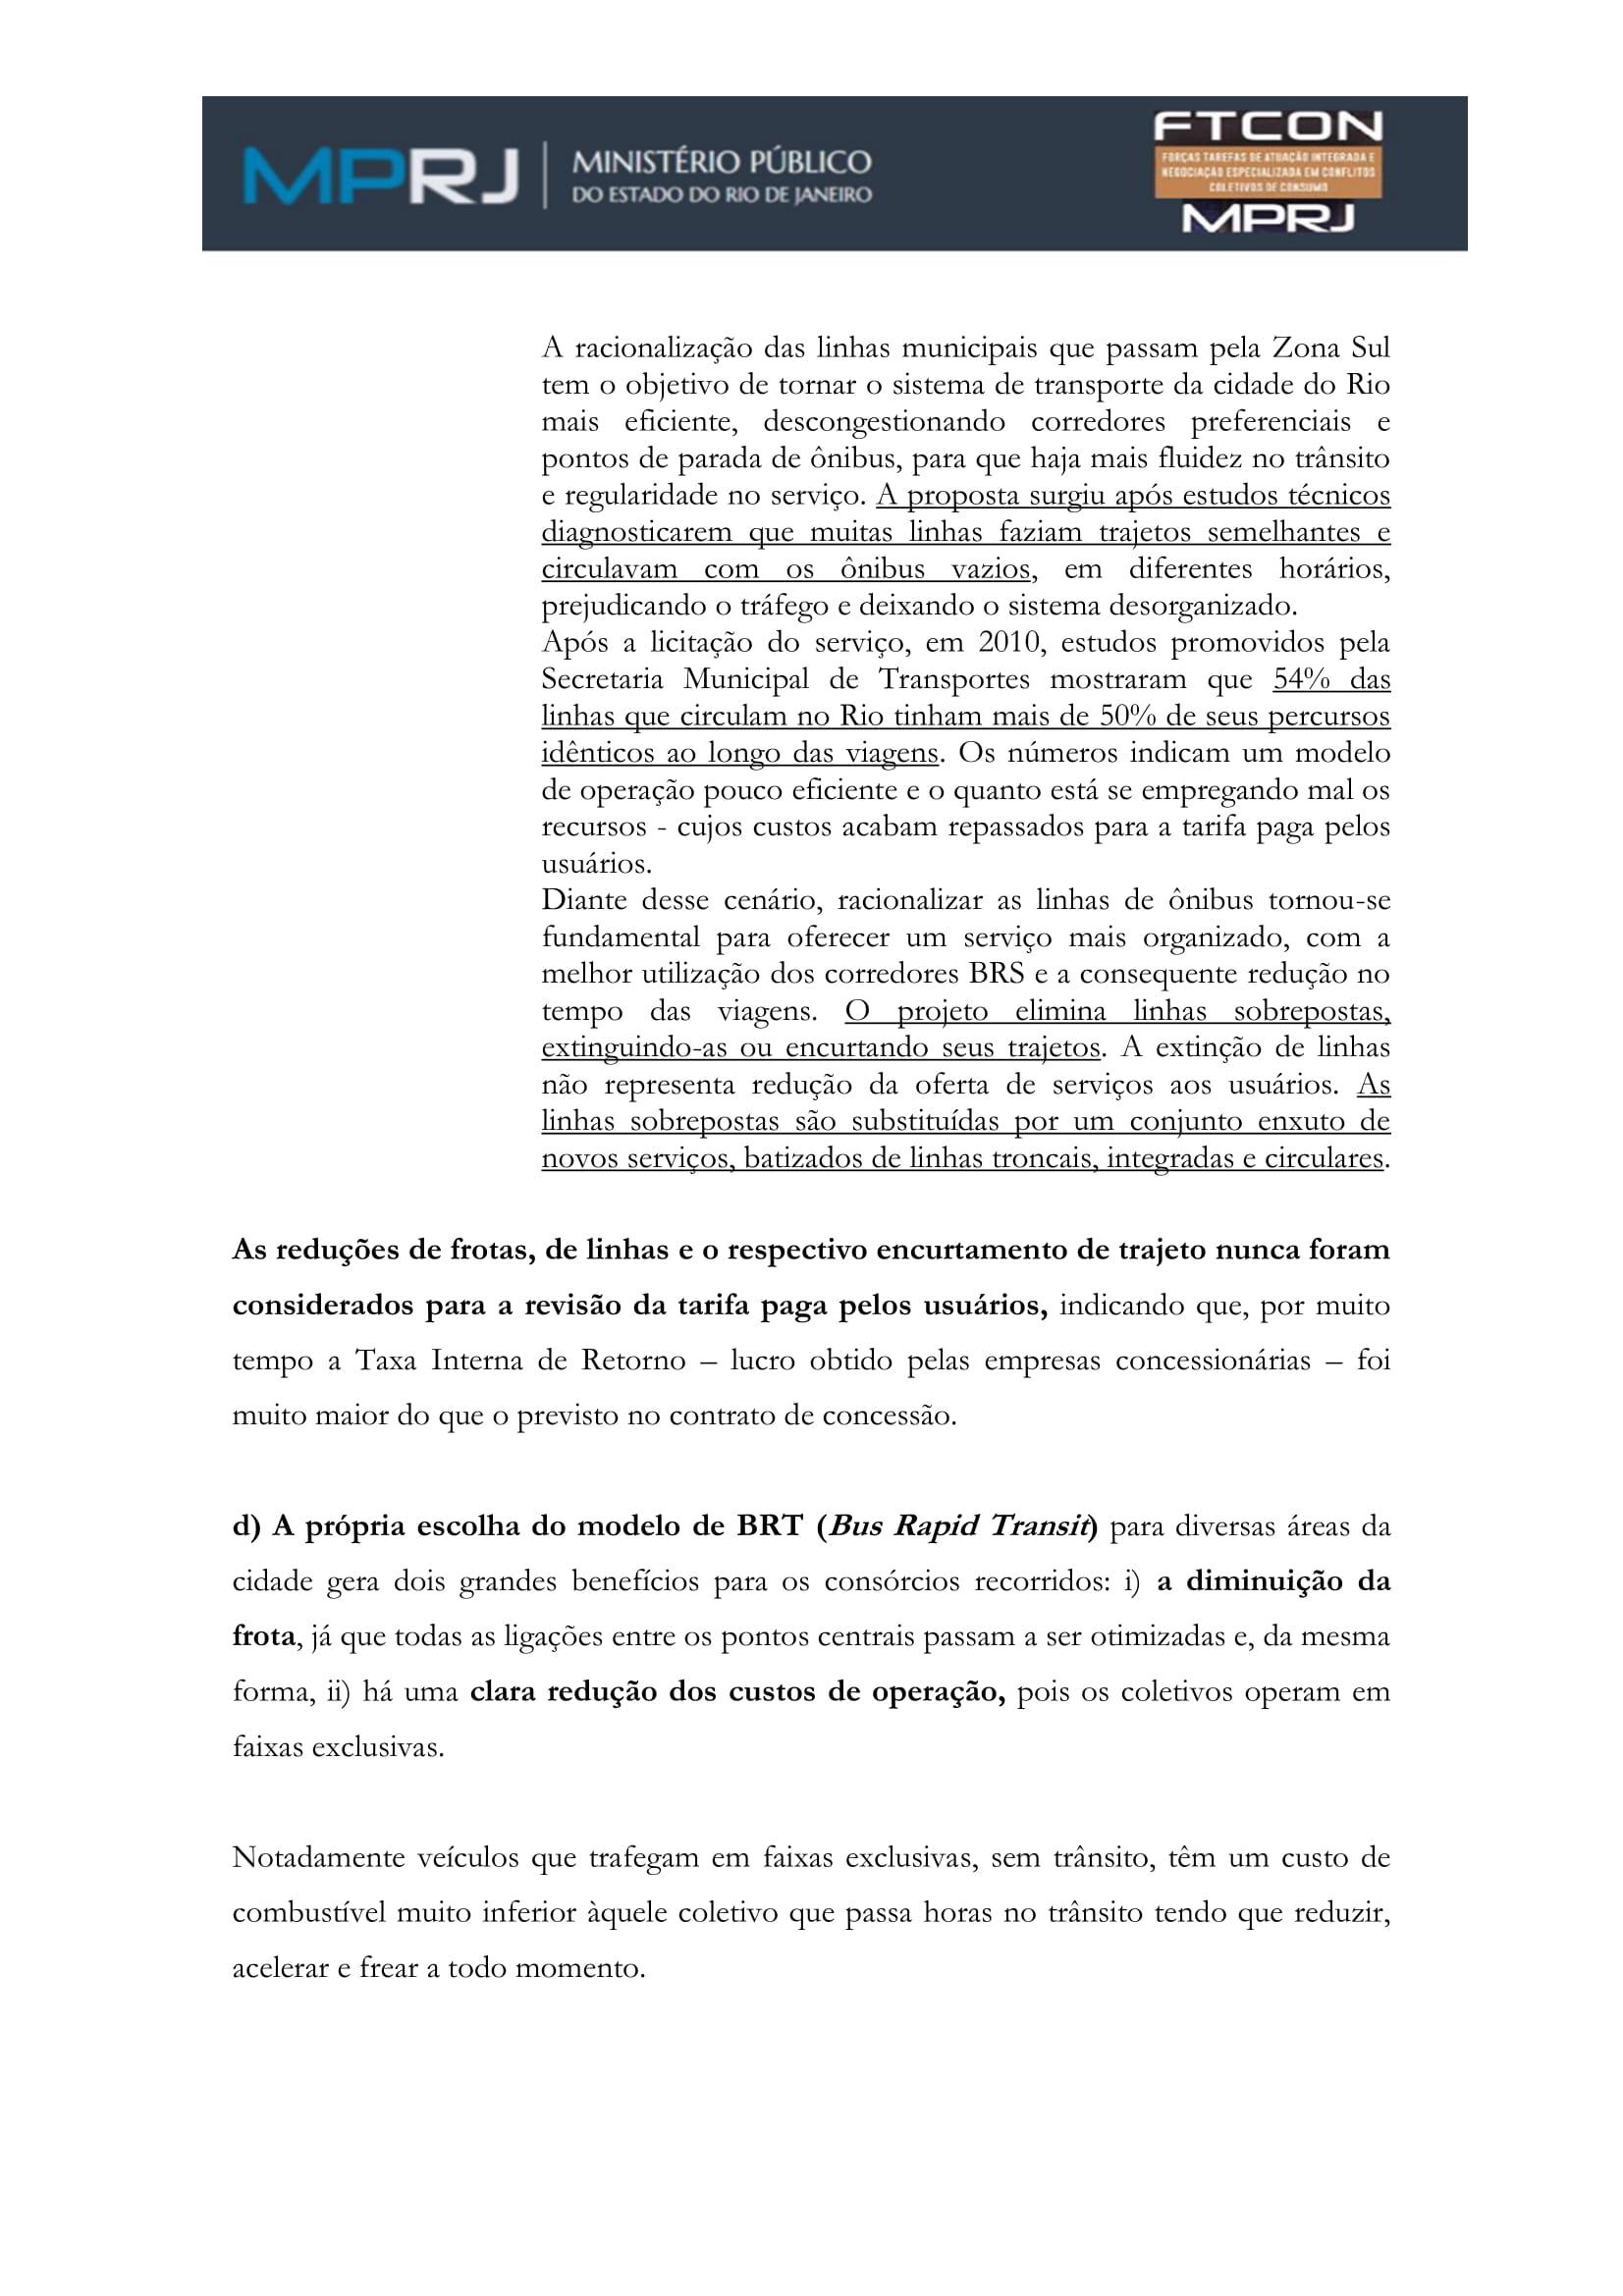 acp_caducidade_onibus_dr_rt-074